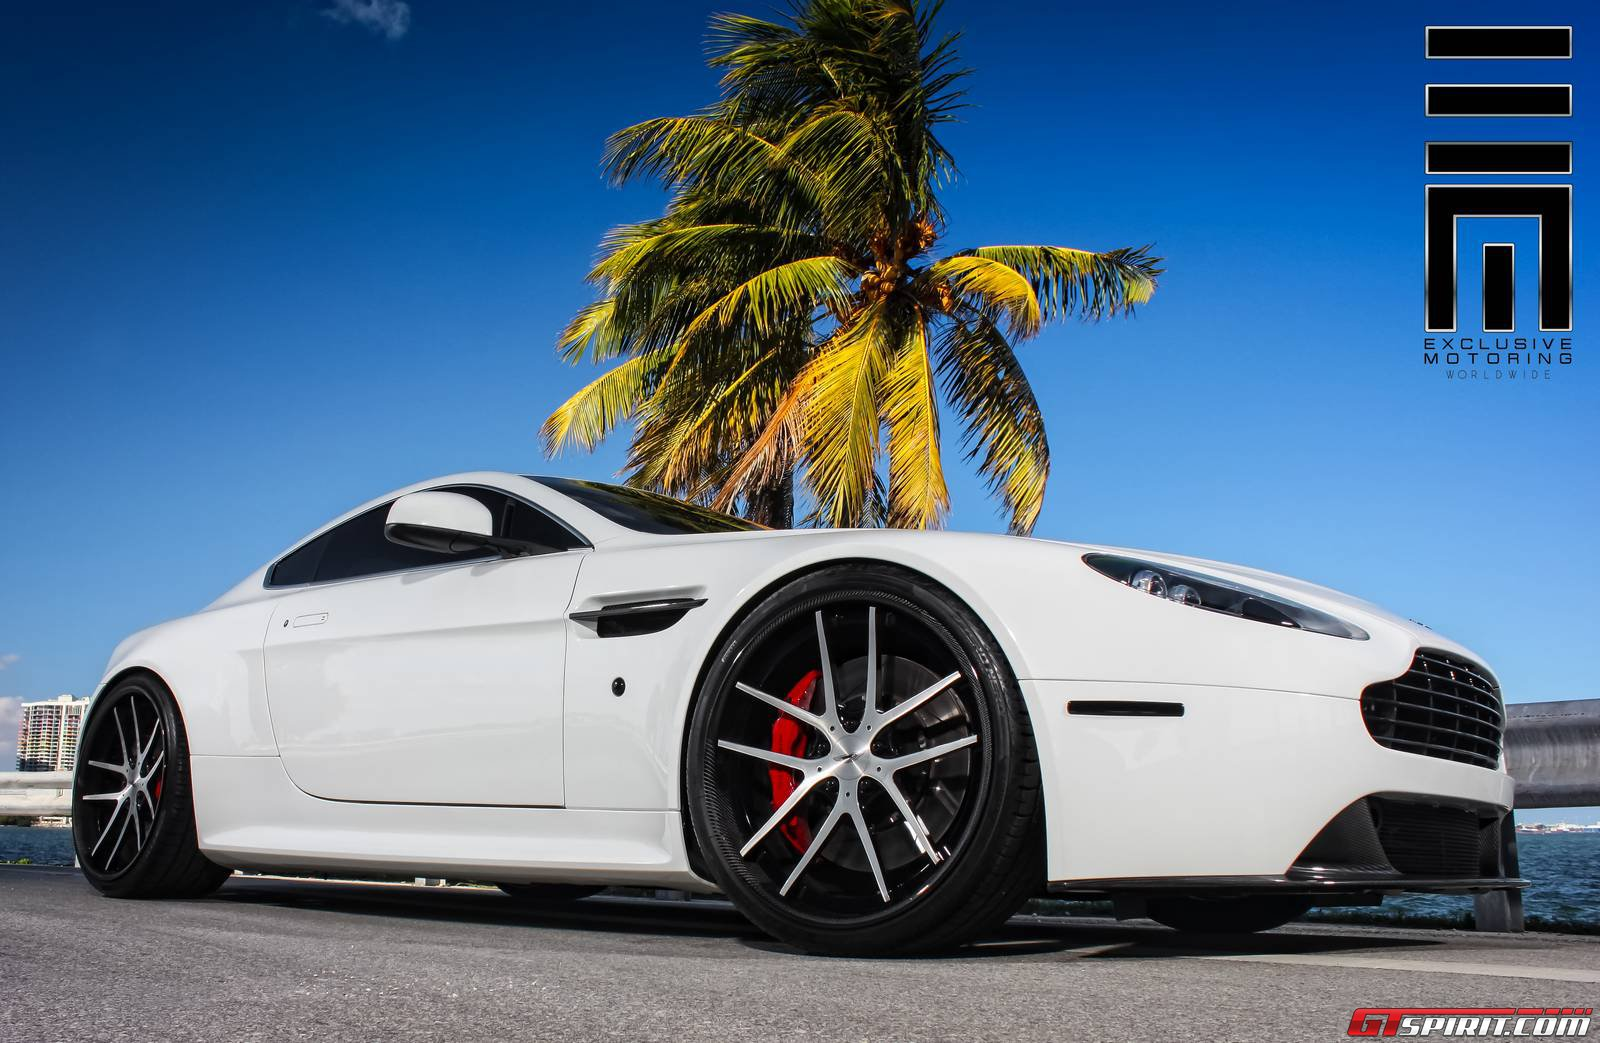 White Aston Martin Vantage S By Exclusive Motoring